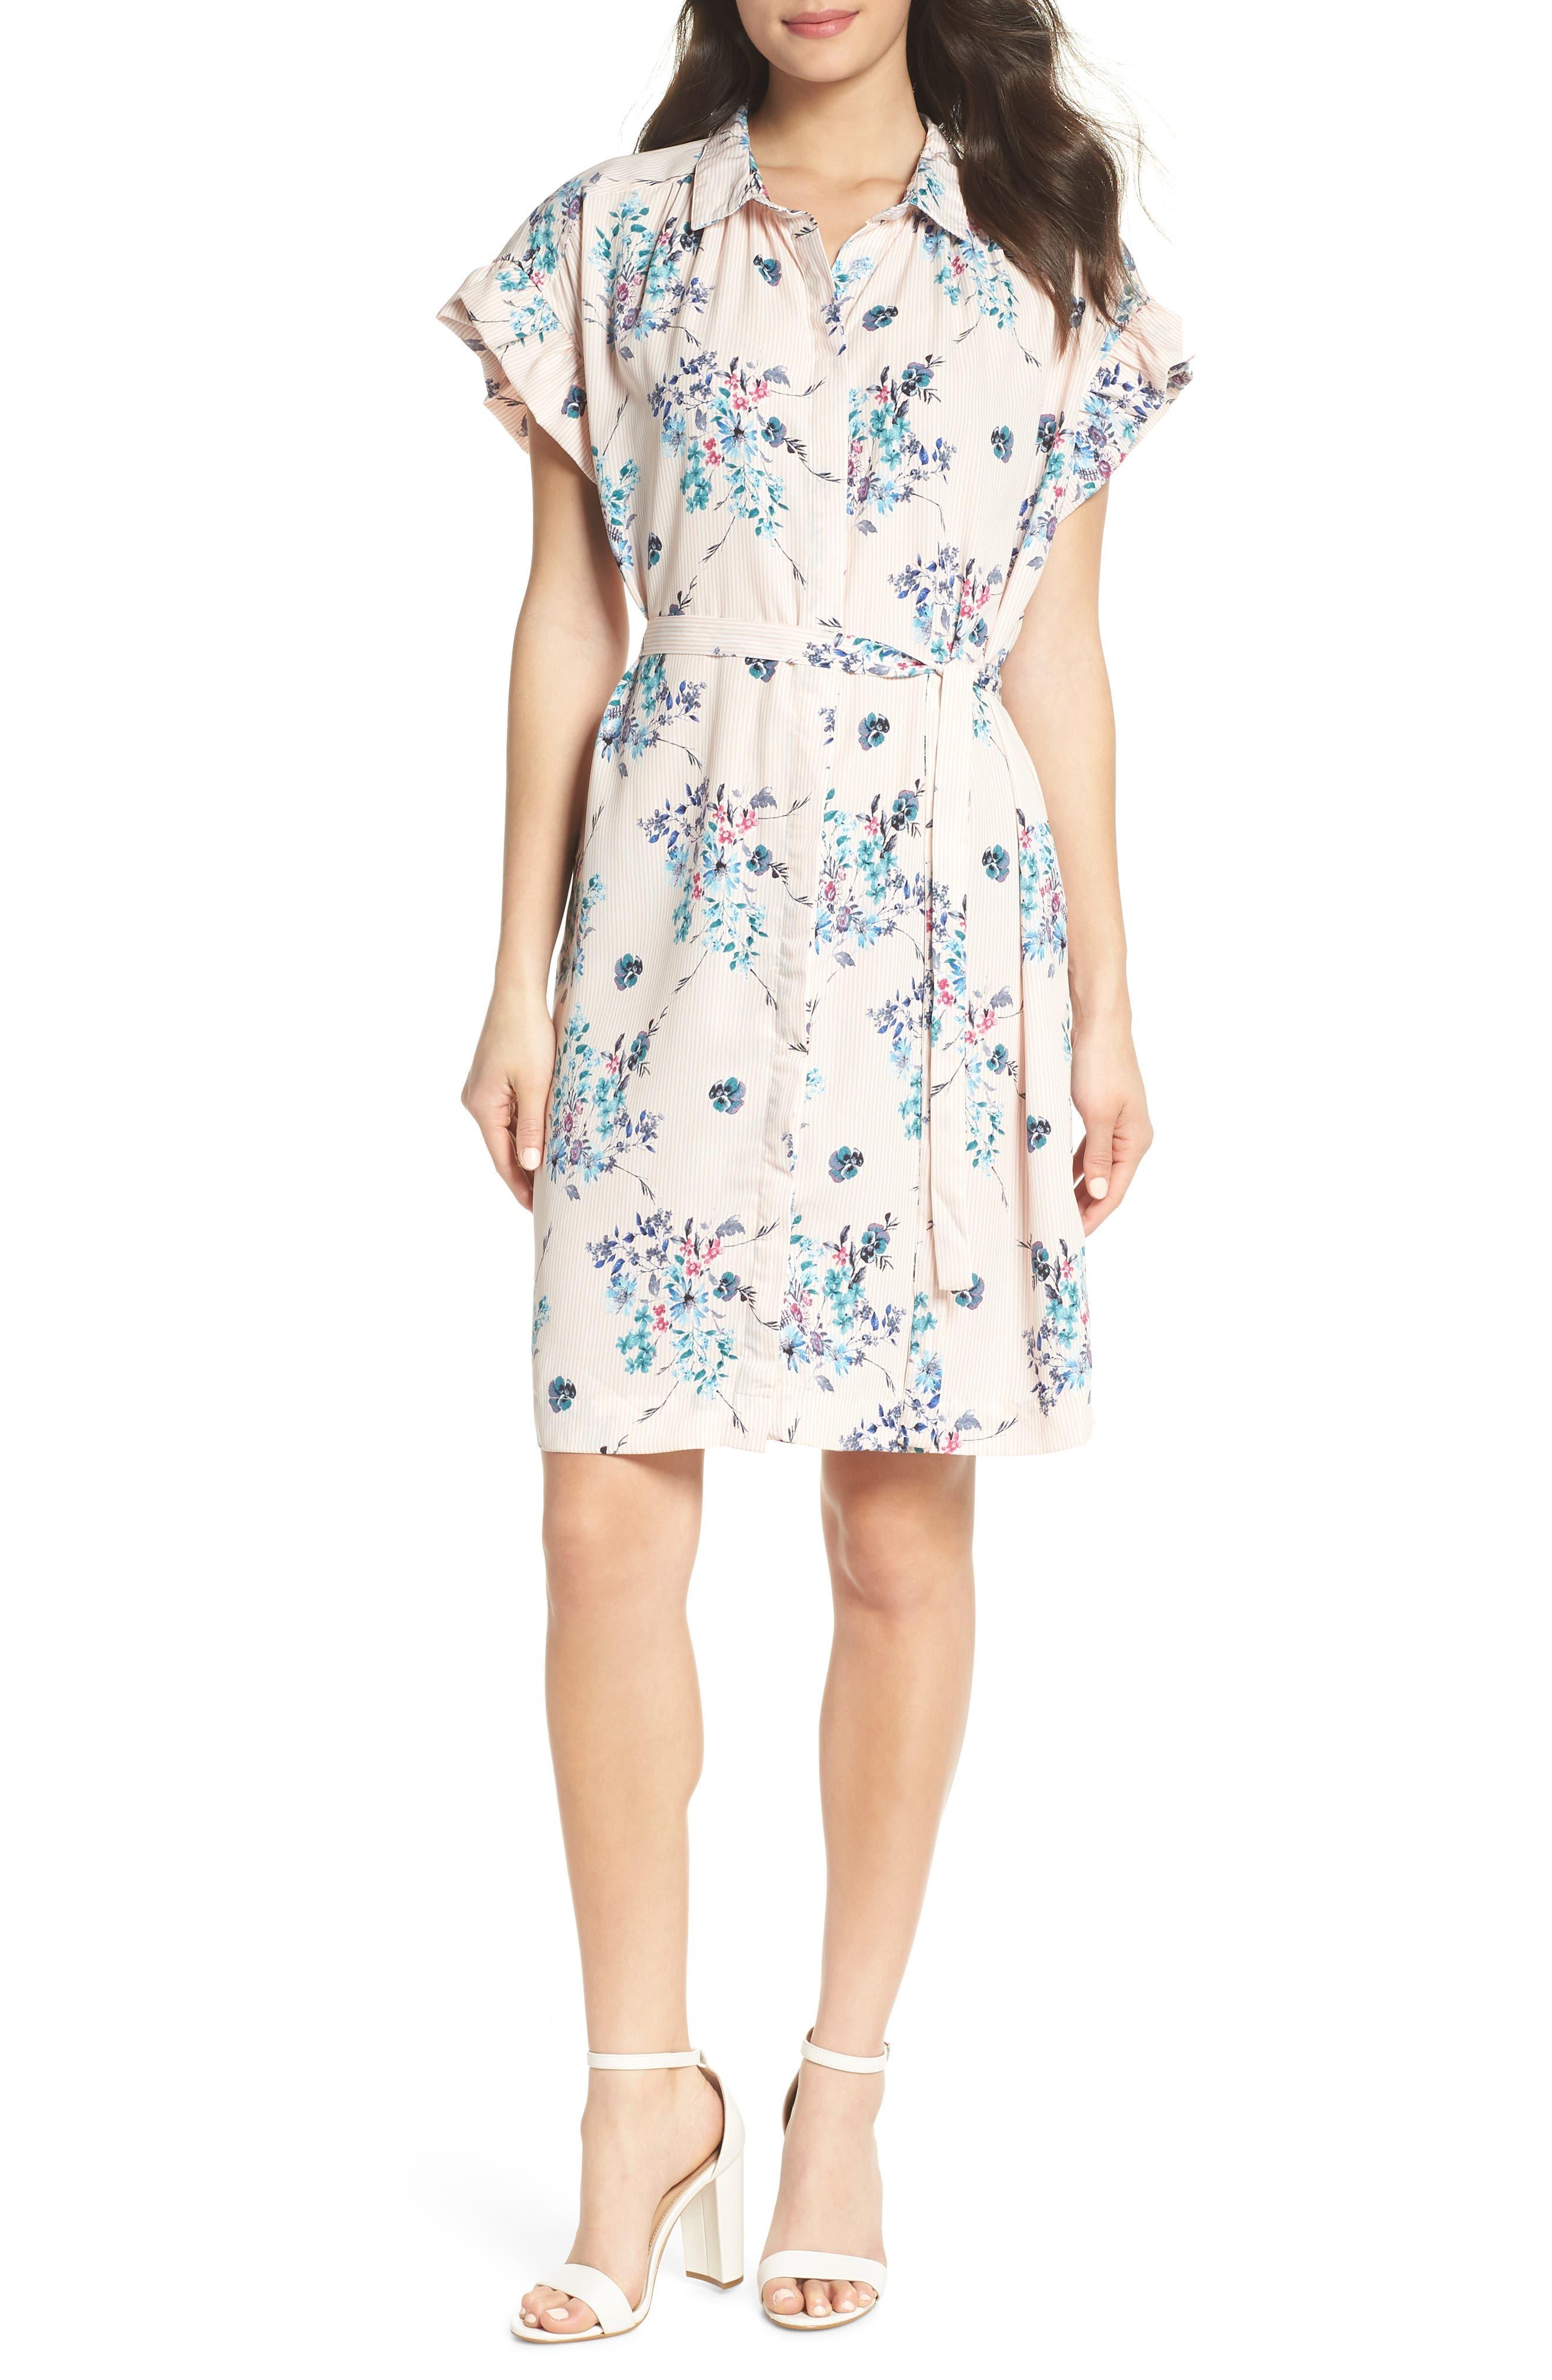 MARY & MABEL Ruffle Sleeve Shirt Dress, Main, color, 652